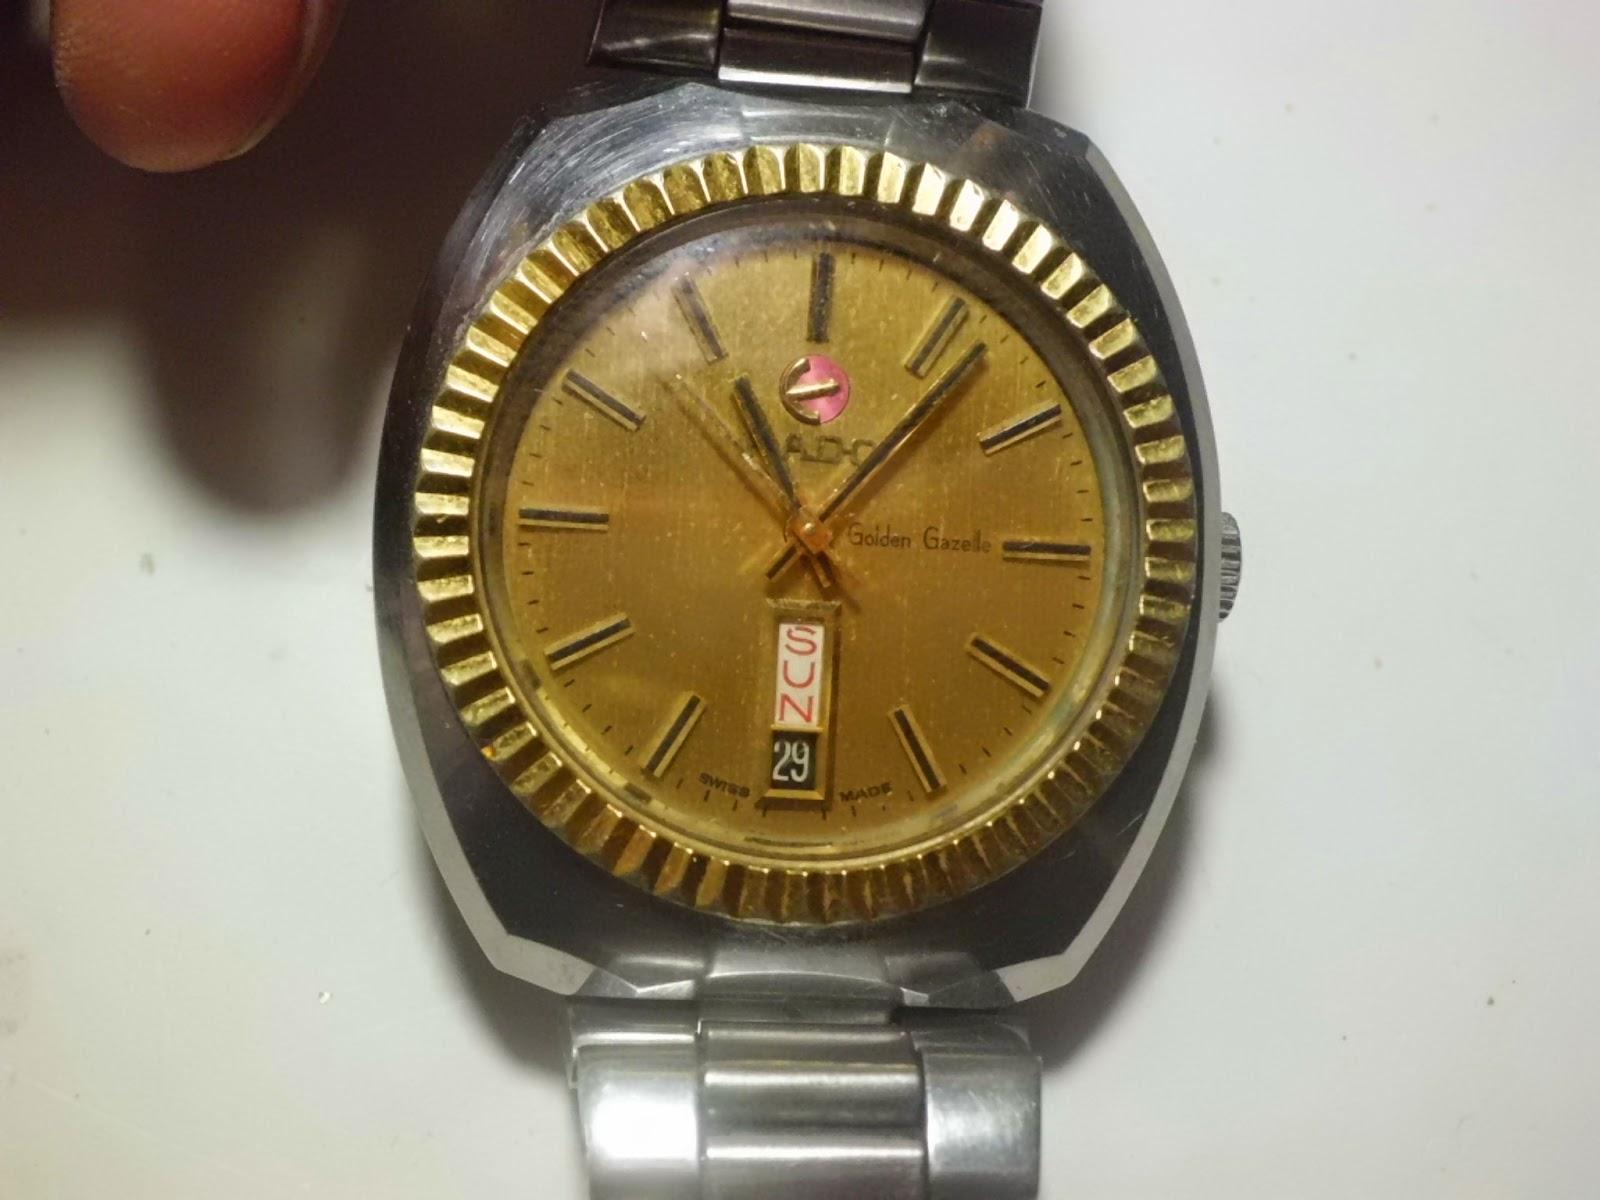 Jam tangan rado automatic ring gold jv 294